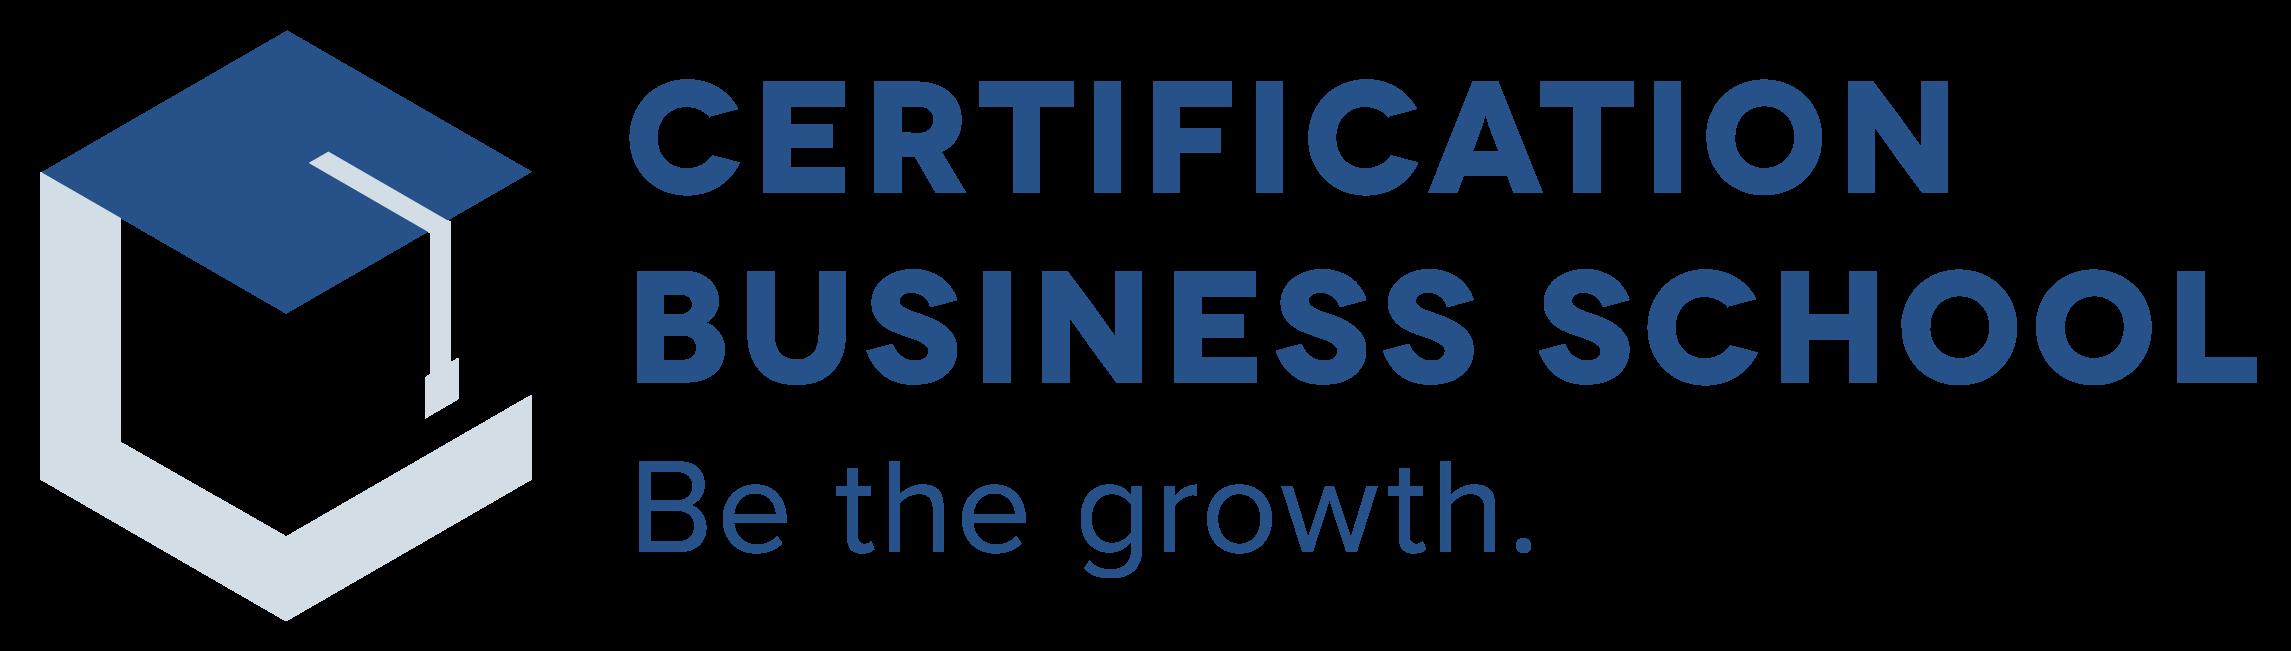 Certification Business School